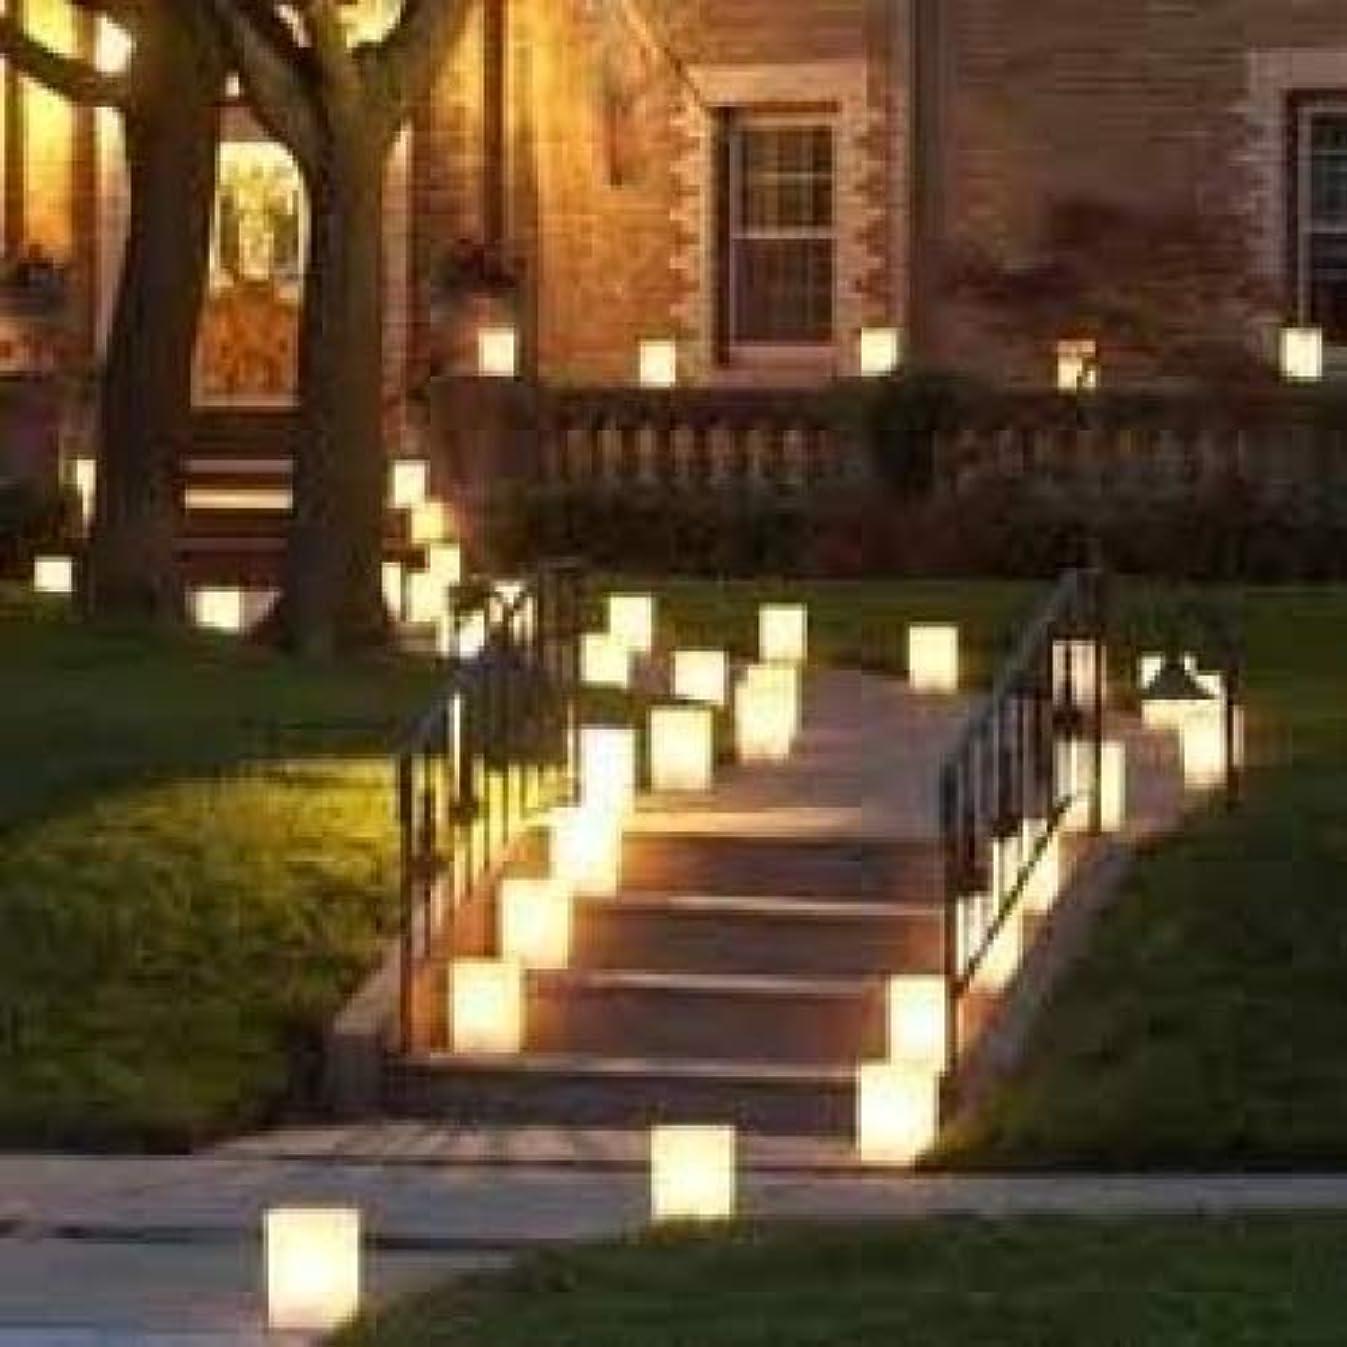 Luminary Set - 100 White Christmas Luminary Bags & 100 Tealight Candles Kit